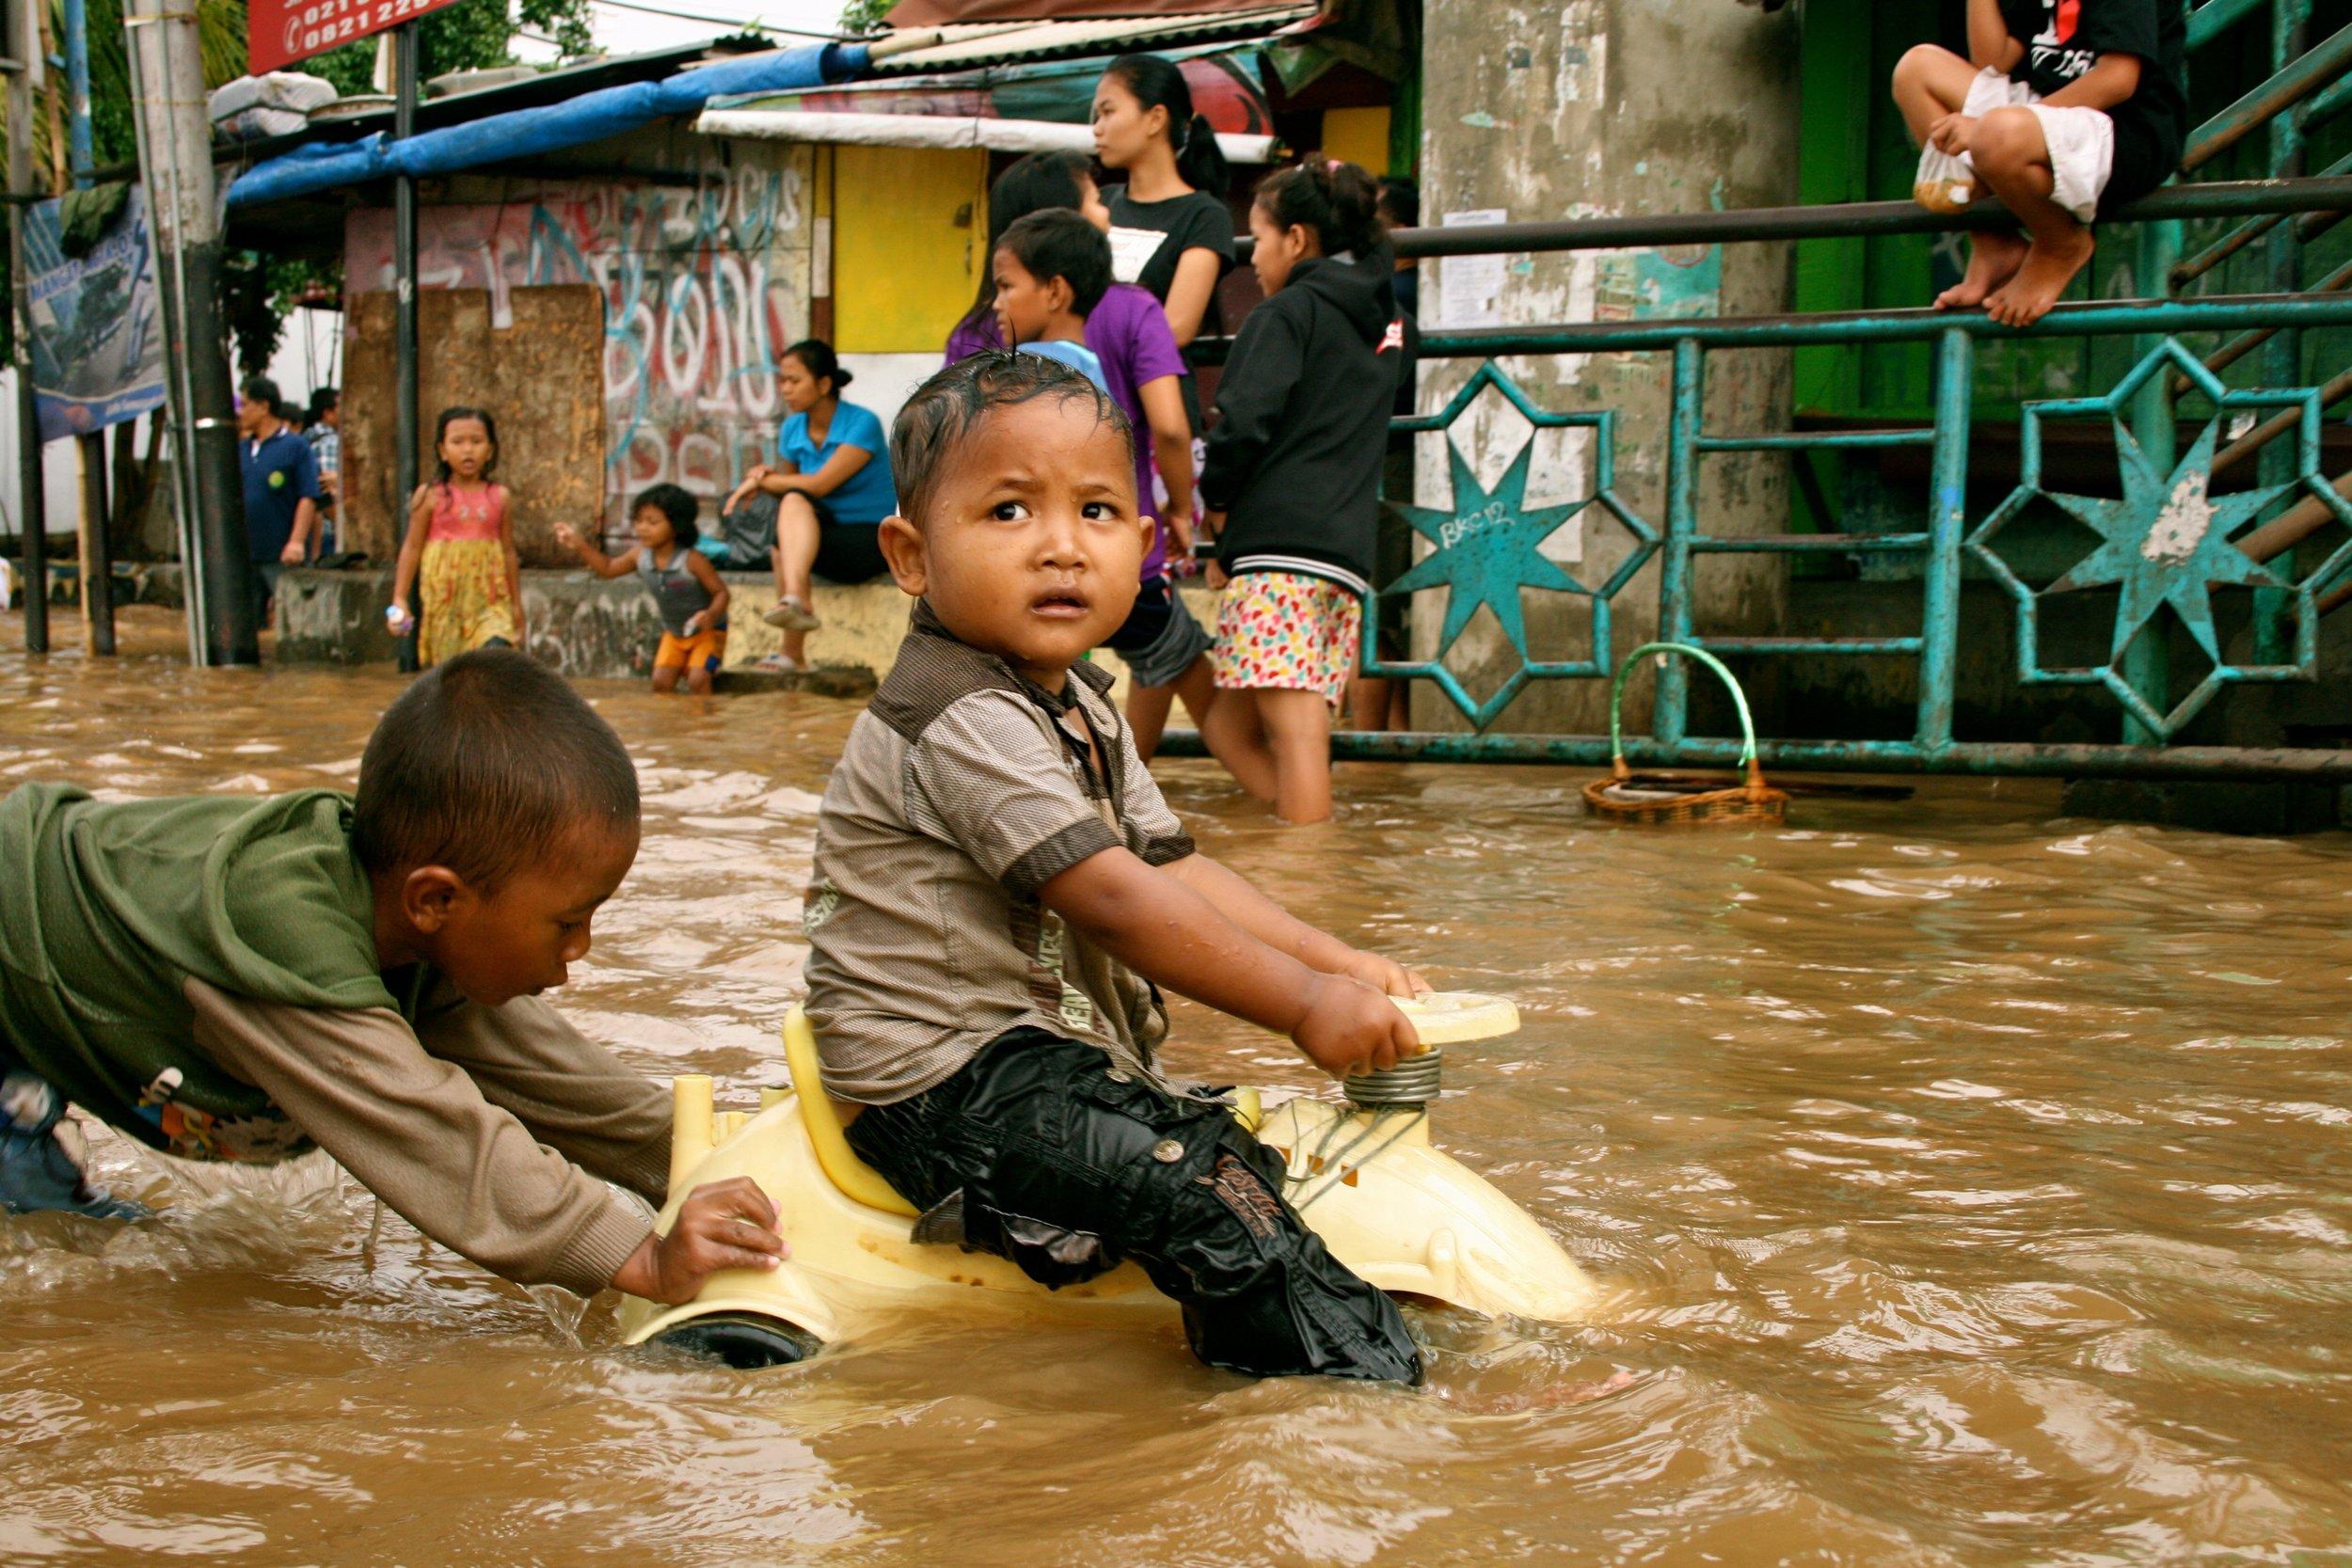 Children play in flood waters after torrential rains in Kampung Melayu, Jakarta. Photo by Kate Lamb, Freelance journalist